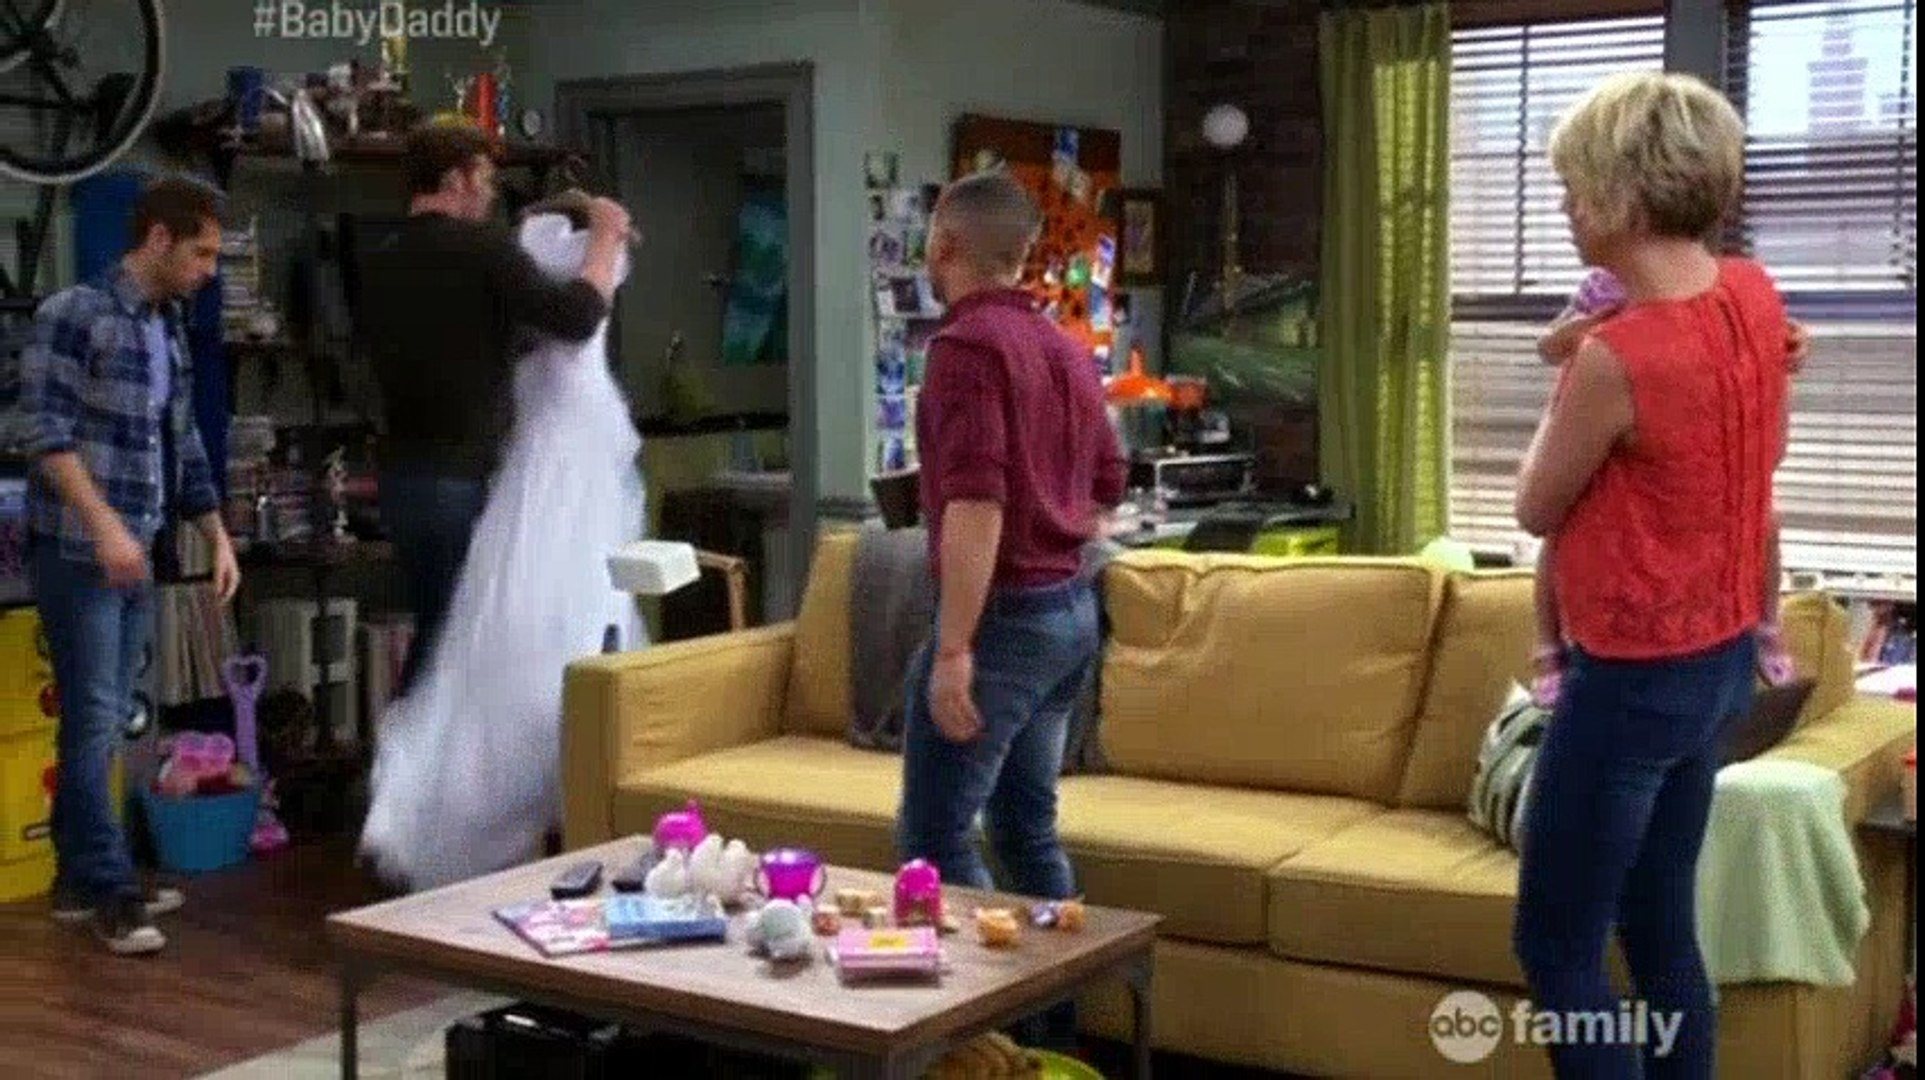 baby daddy season 4 full episodes online free